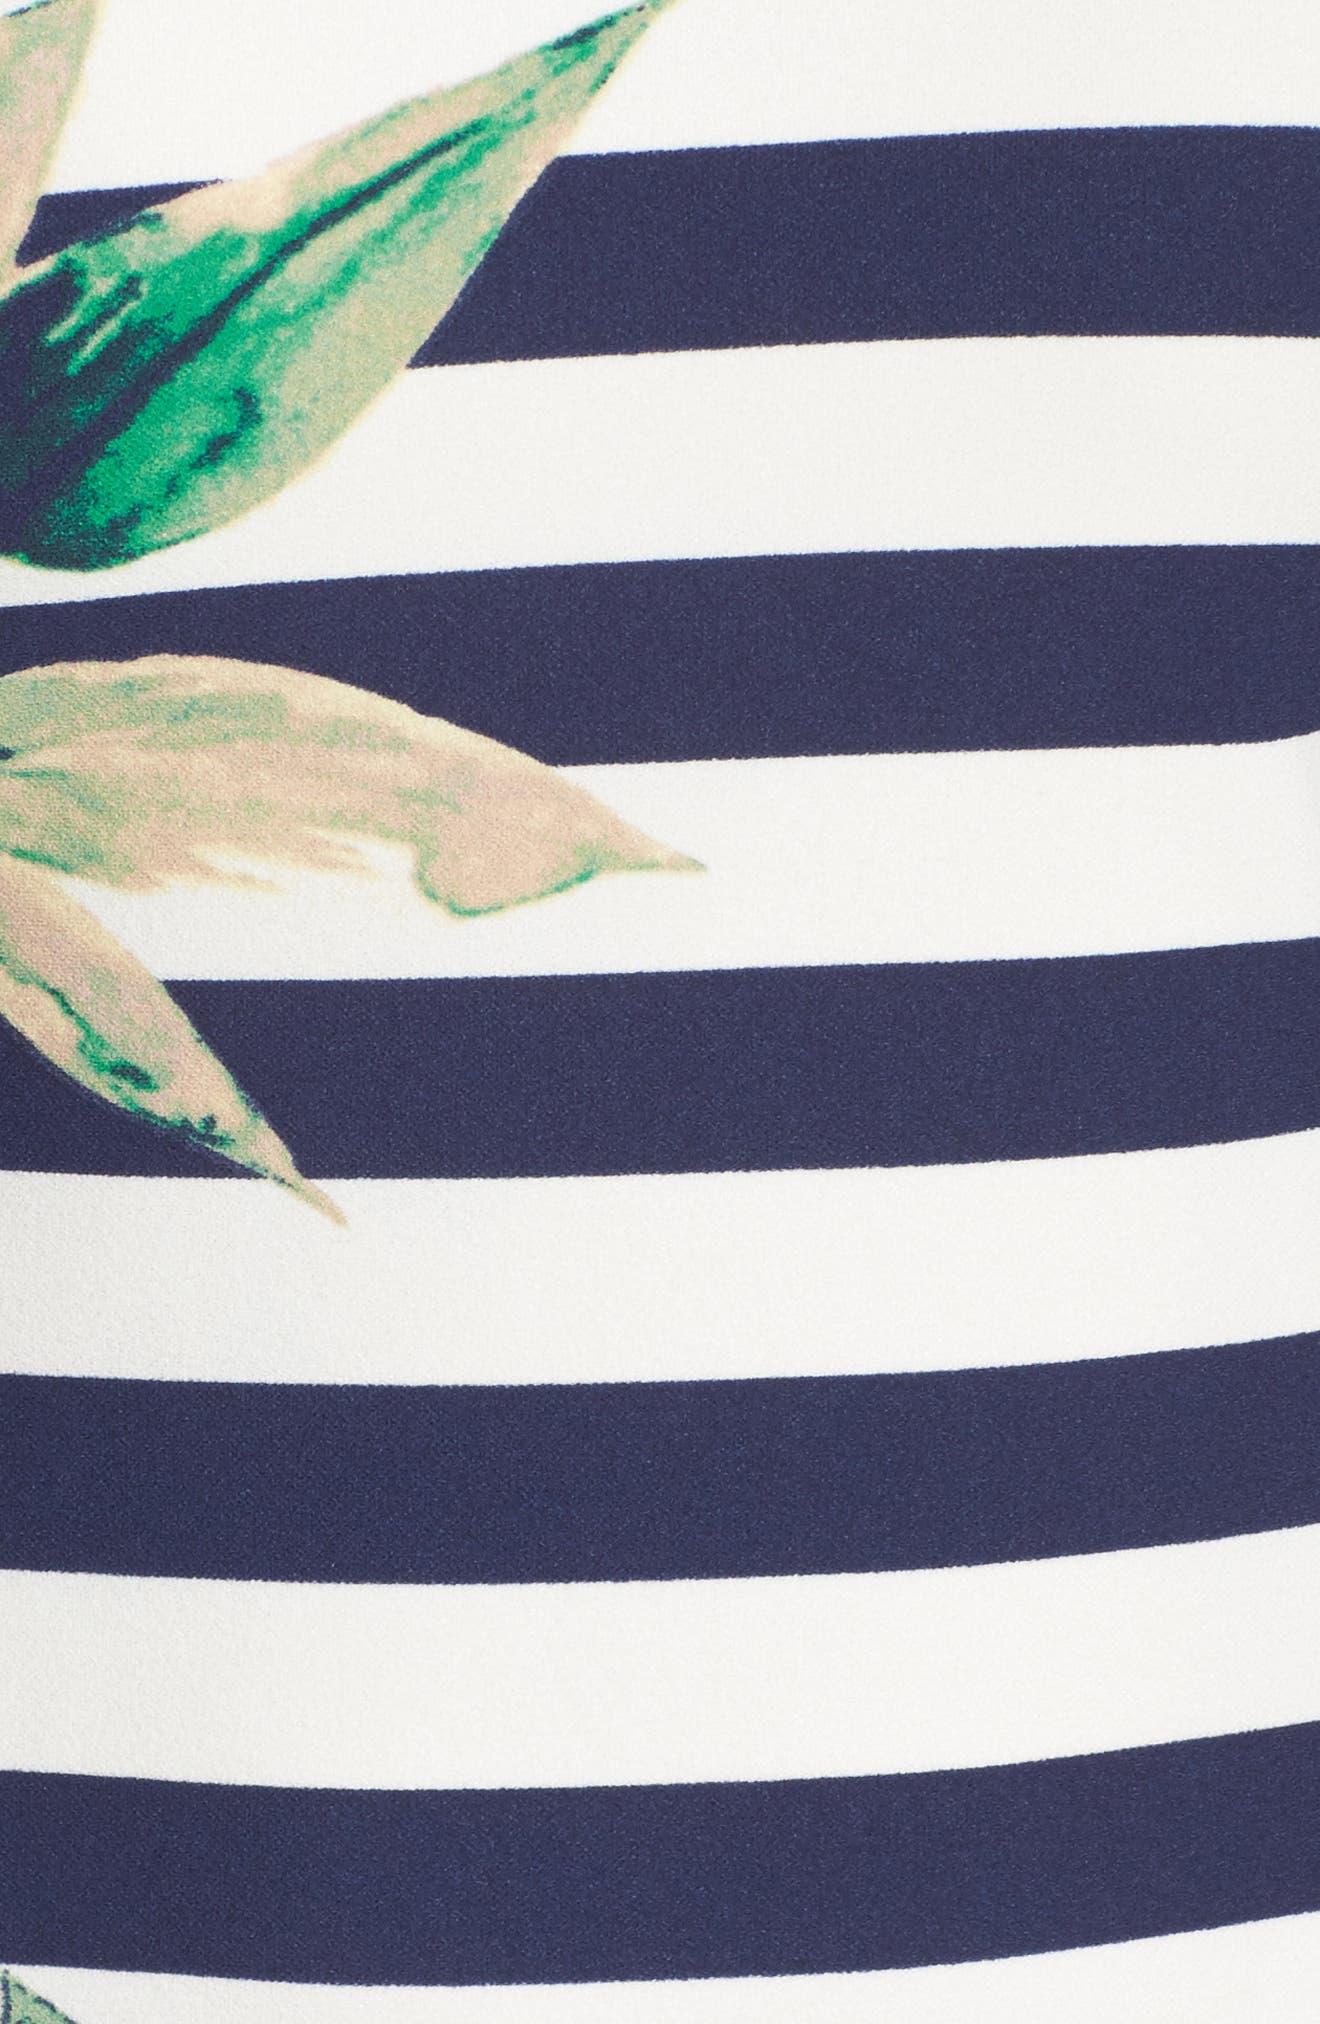 Stripe Off the Shoulder Dress,                             Alternate thumbnail 5, color,                             Navy